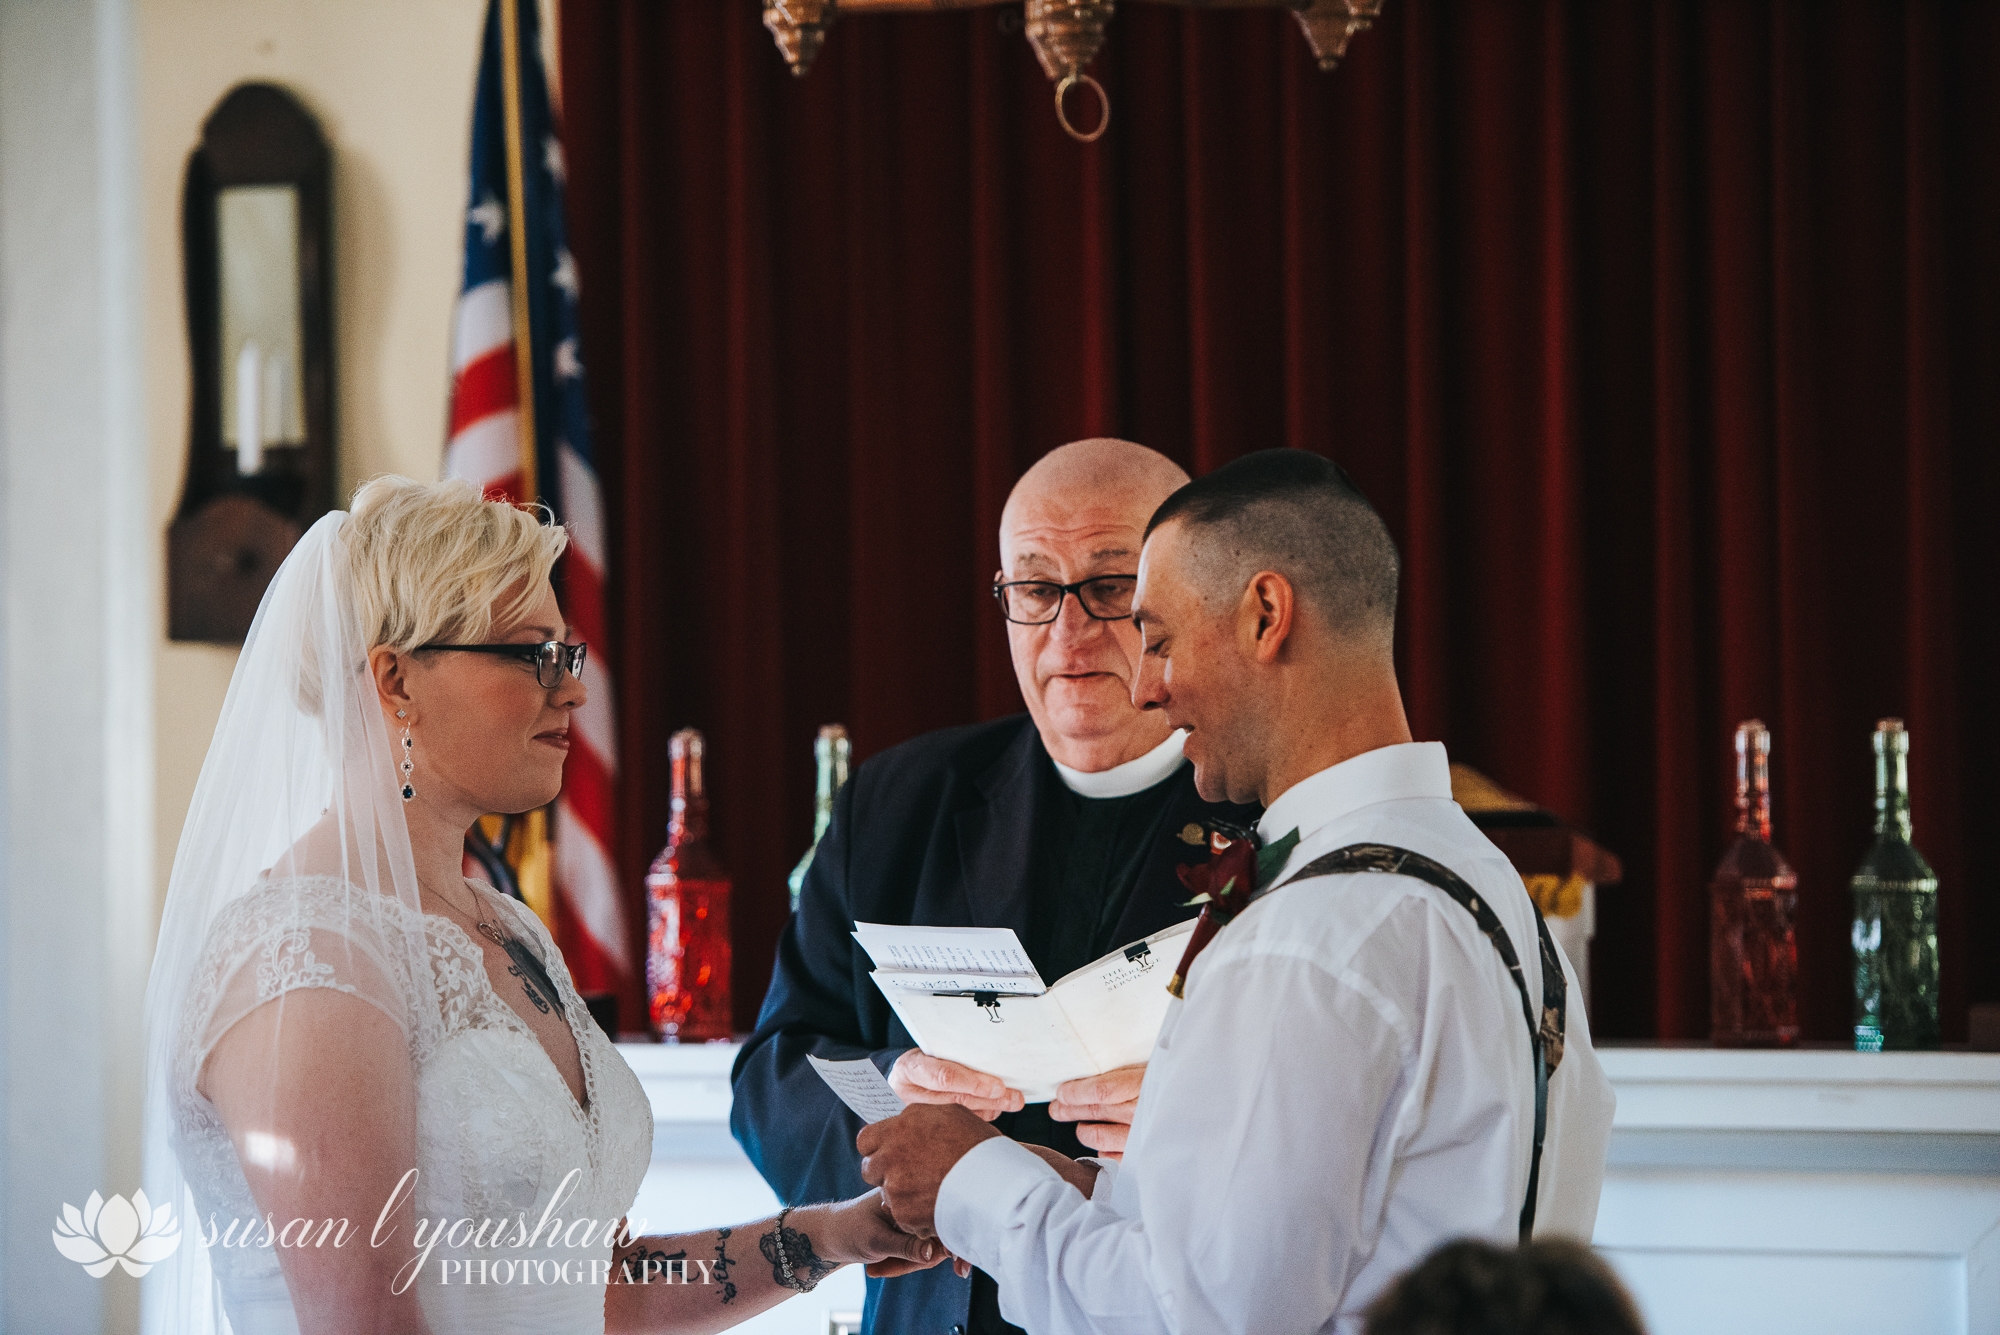 BLOG Rachael and Keith 11-10-2018 SLY Photography LLC-75.jpg